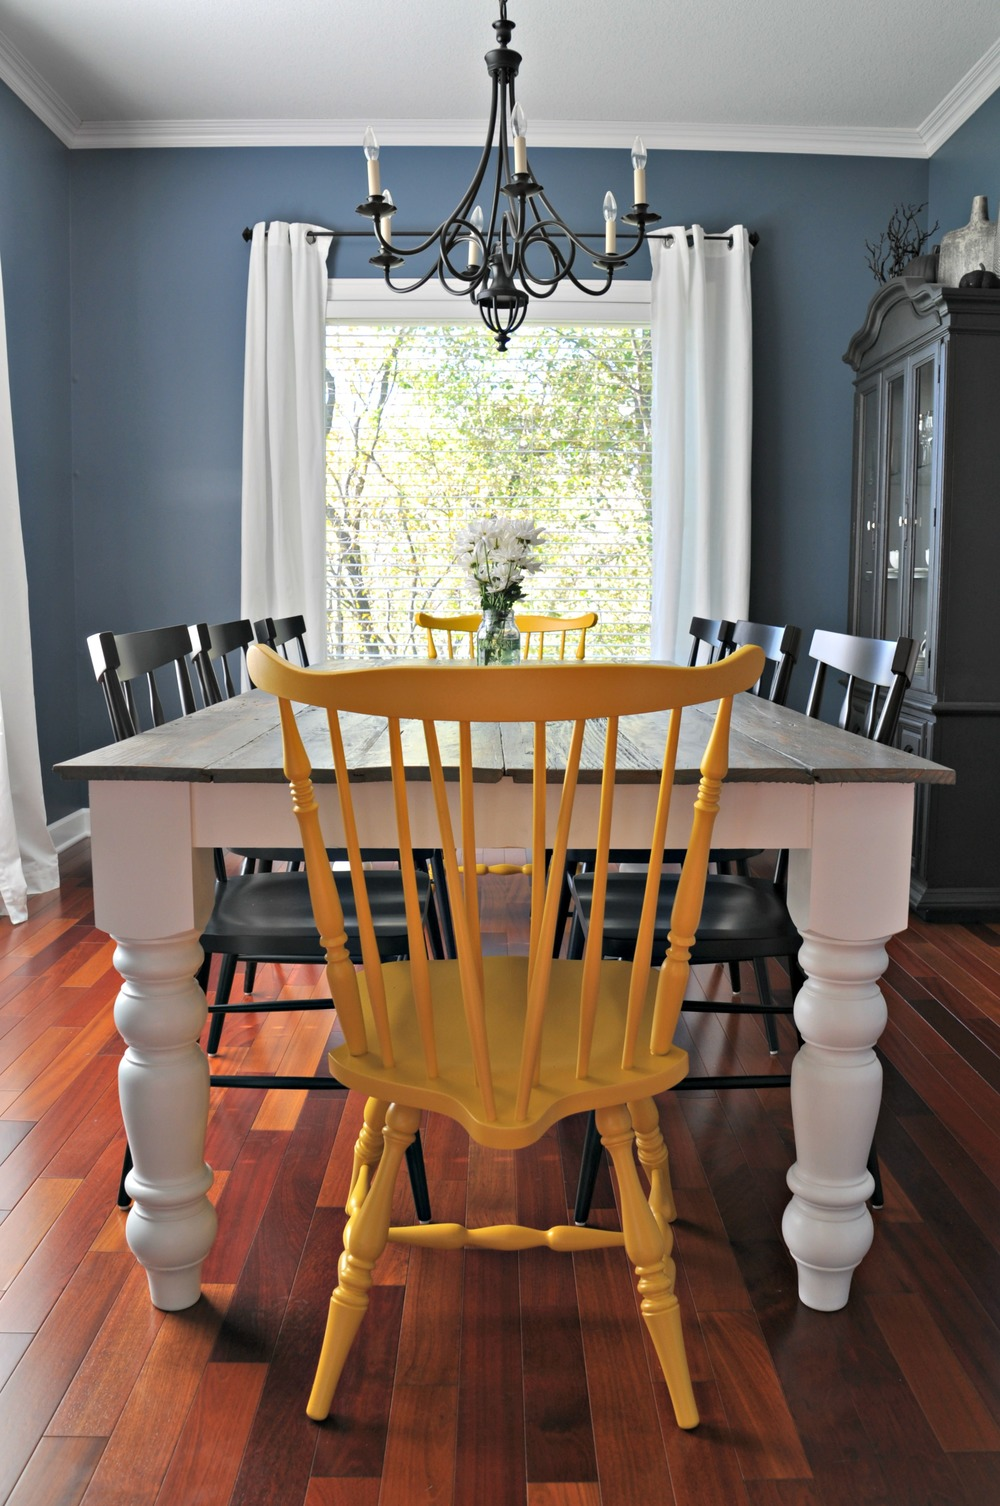 Free Farmhouse Dining Table Plans, Farm Table Dining Room